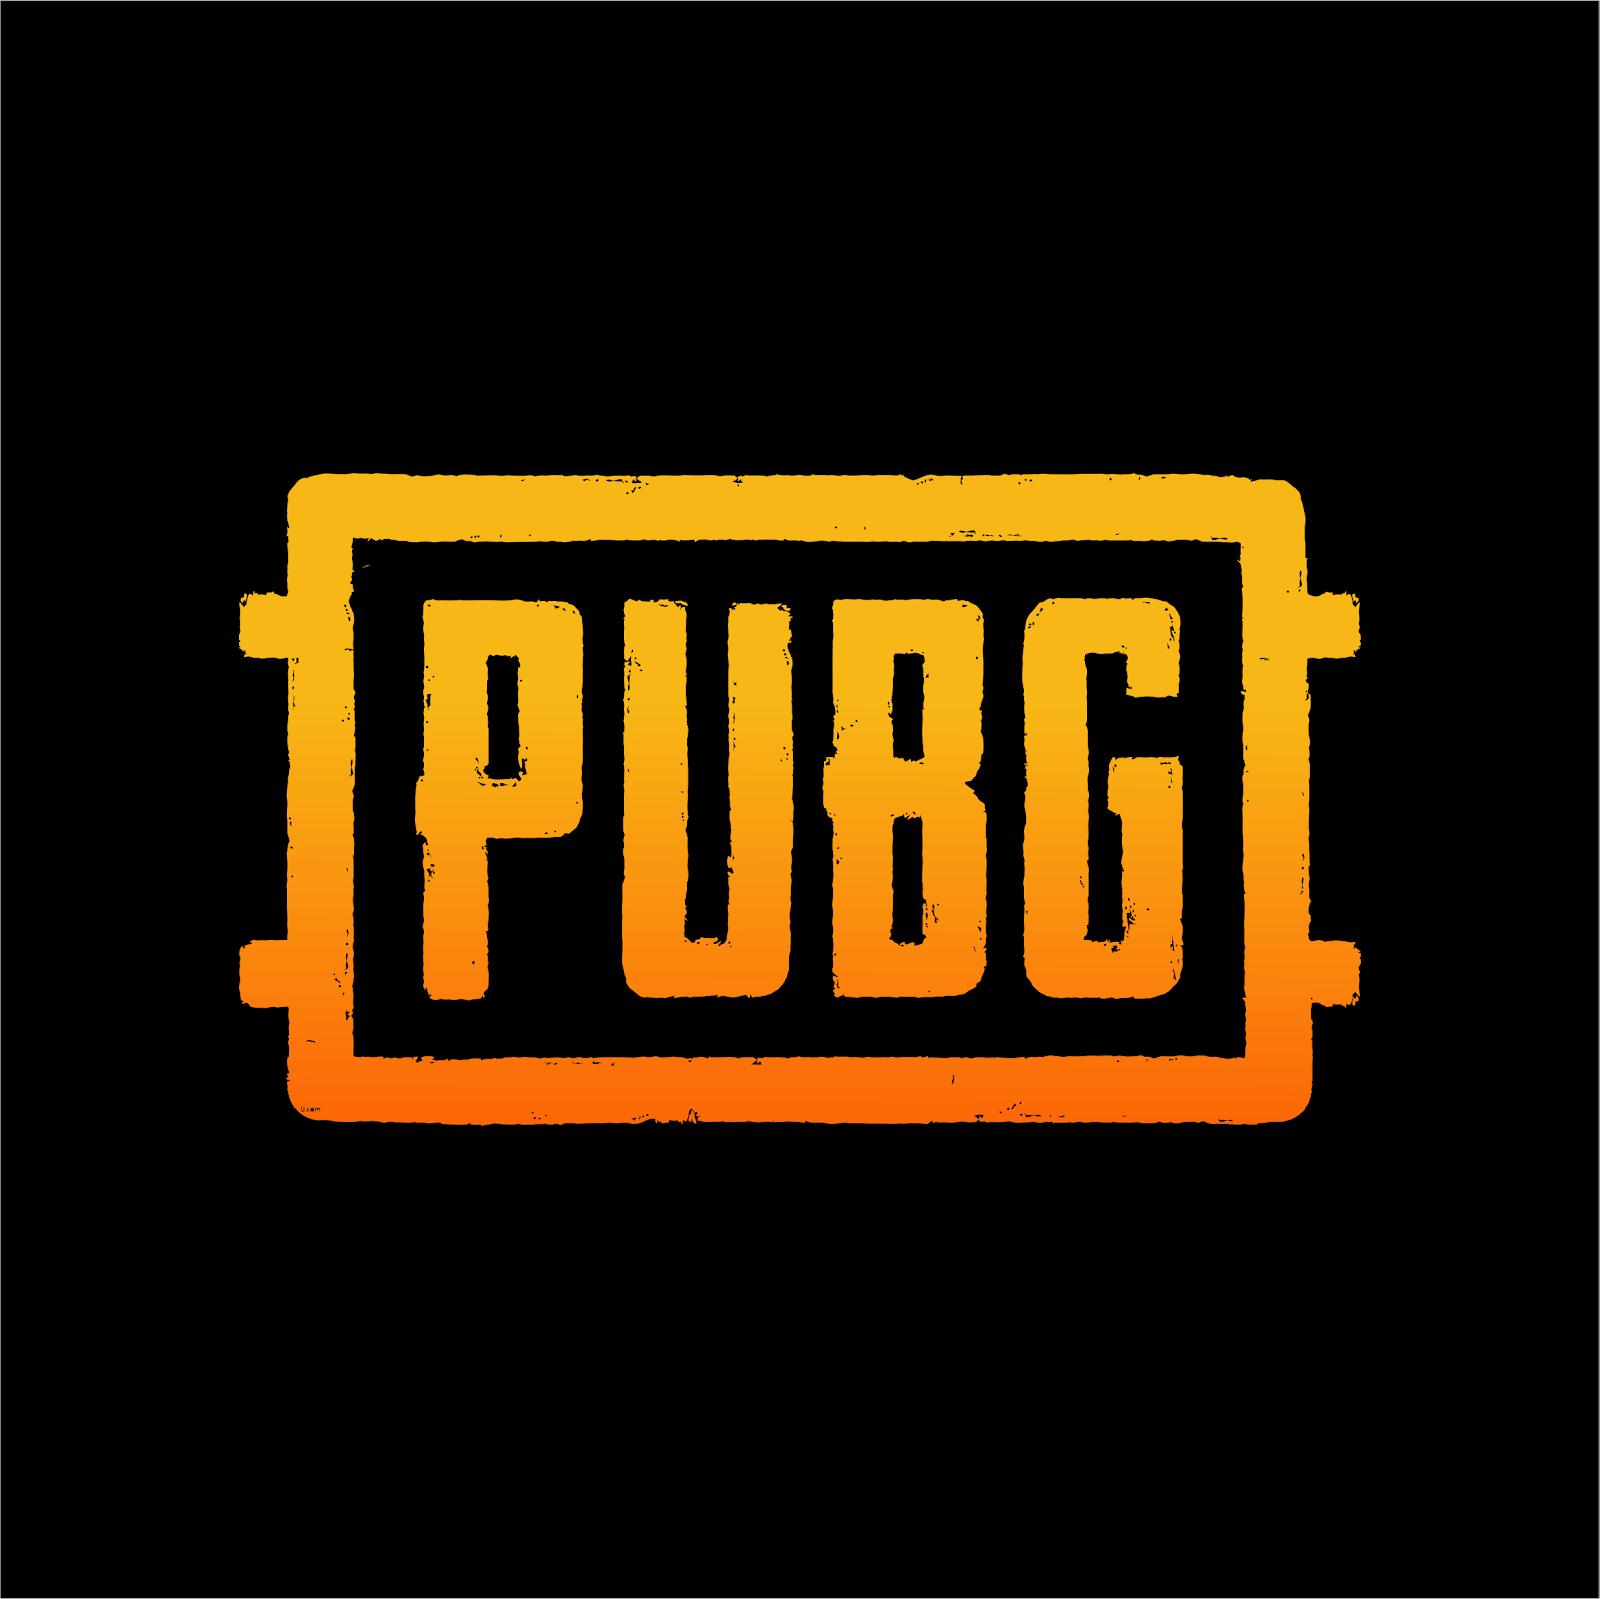 Pubg Playerunknowns Battlegrounds Logo Vector Cdr Download